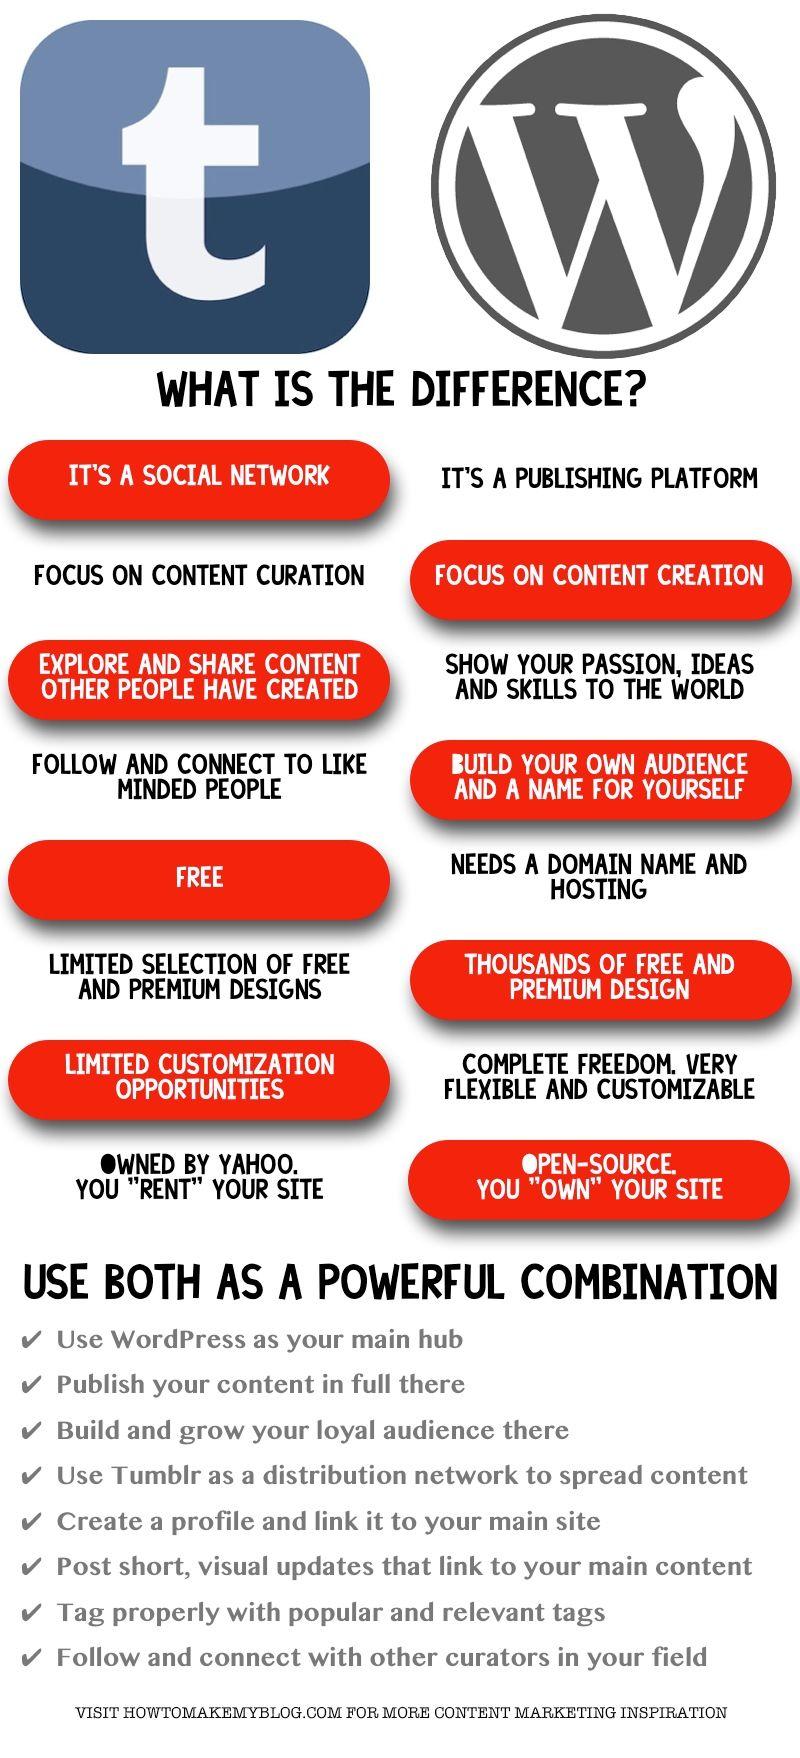 Tumblr Vs WordPress Comparison: A Powerful Combination